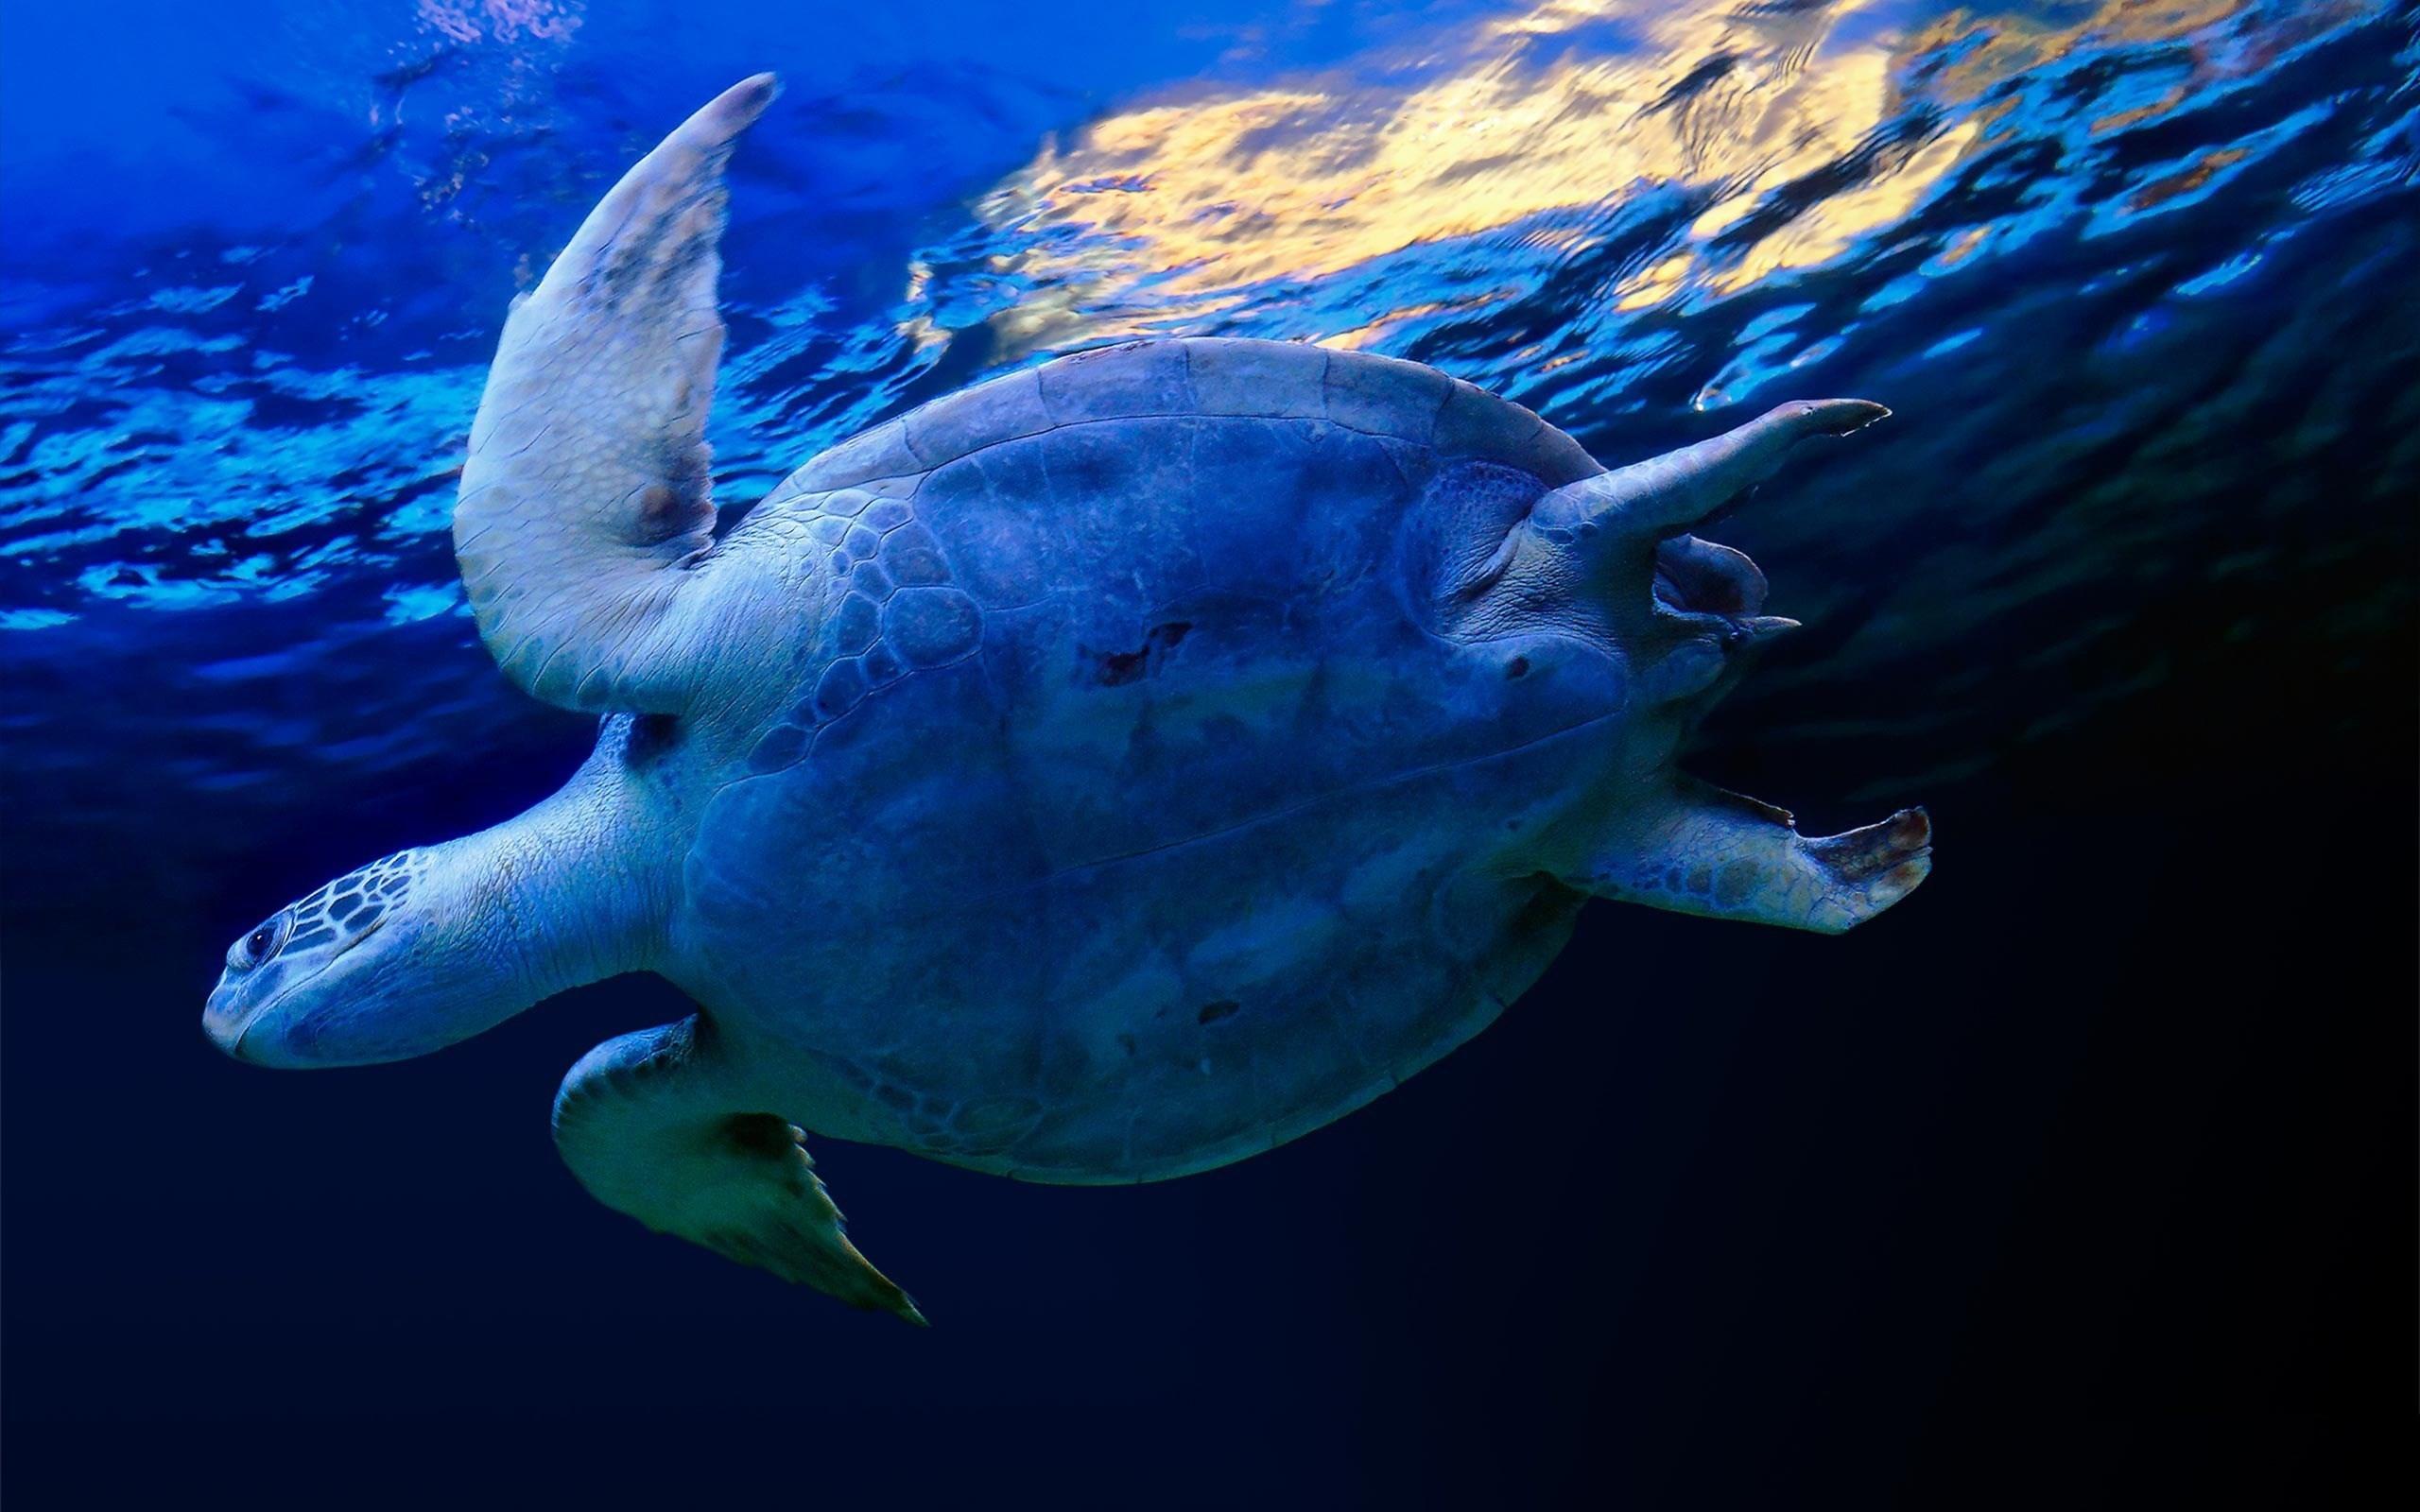 wallpaper desktop turtle